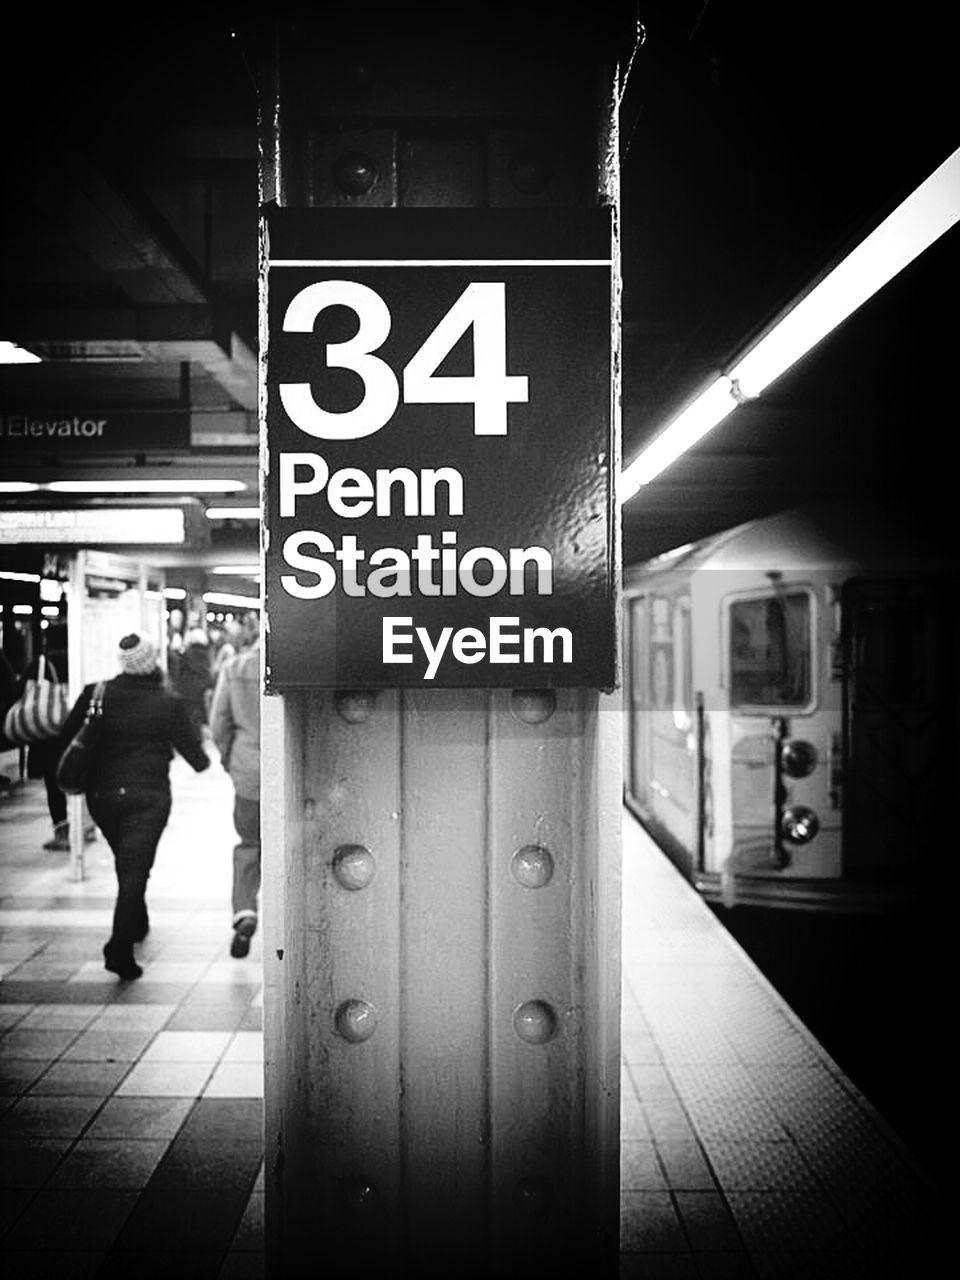 Text on metallic column with passengers walking on subway station